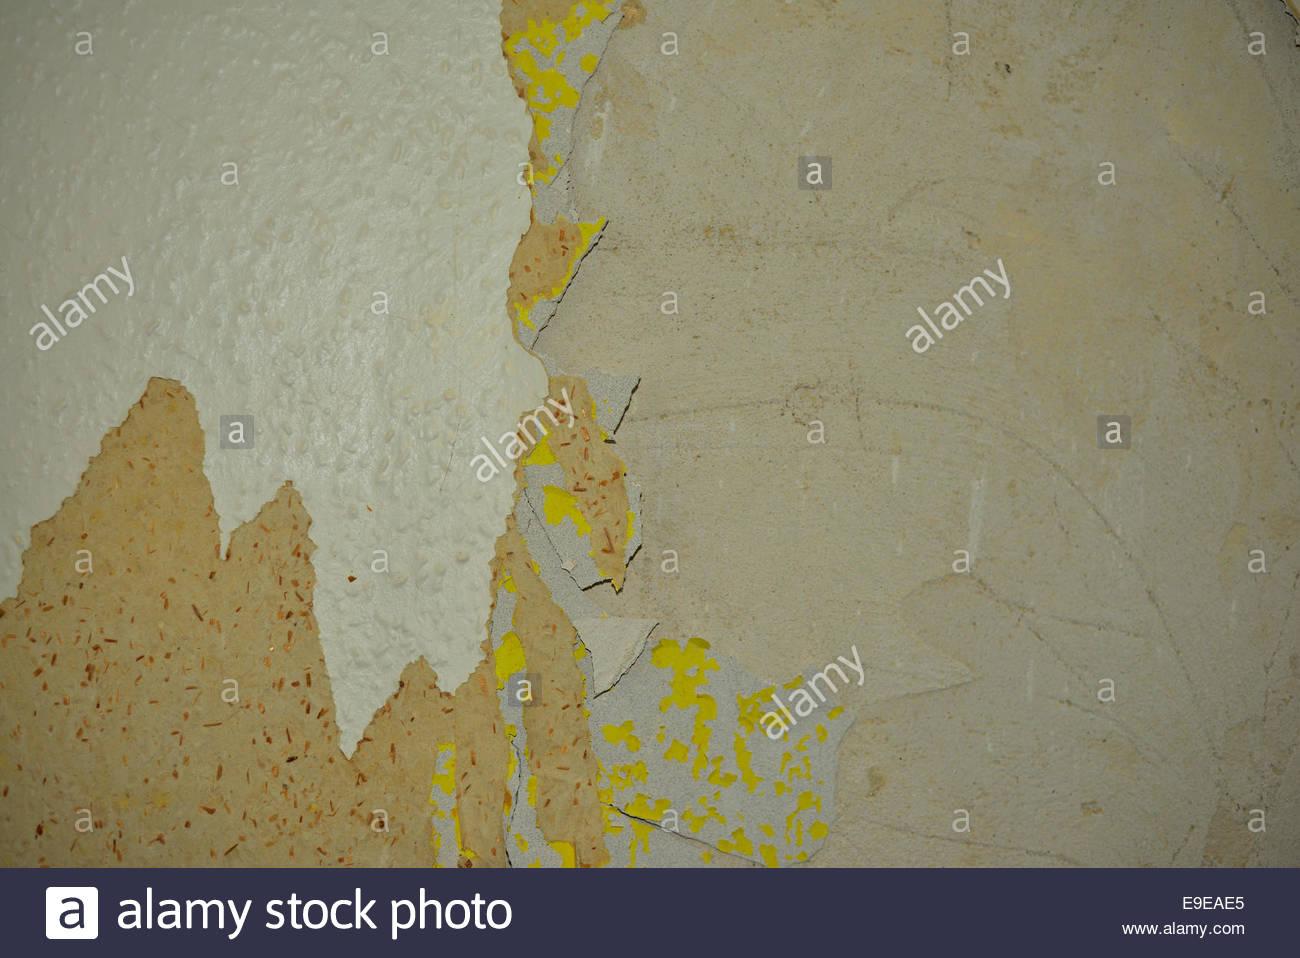 Peeling Woodchip On Walls   Stock Image